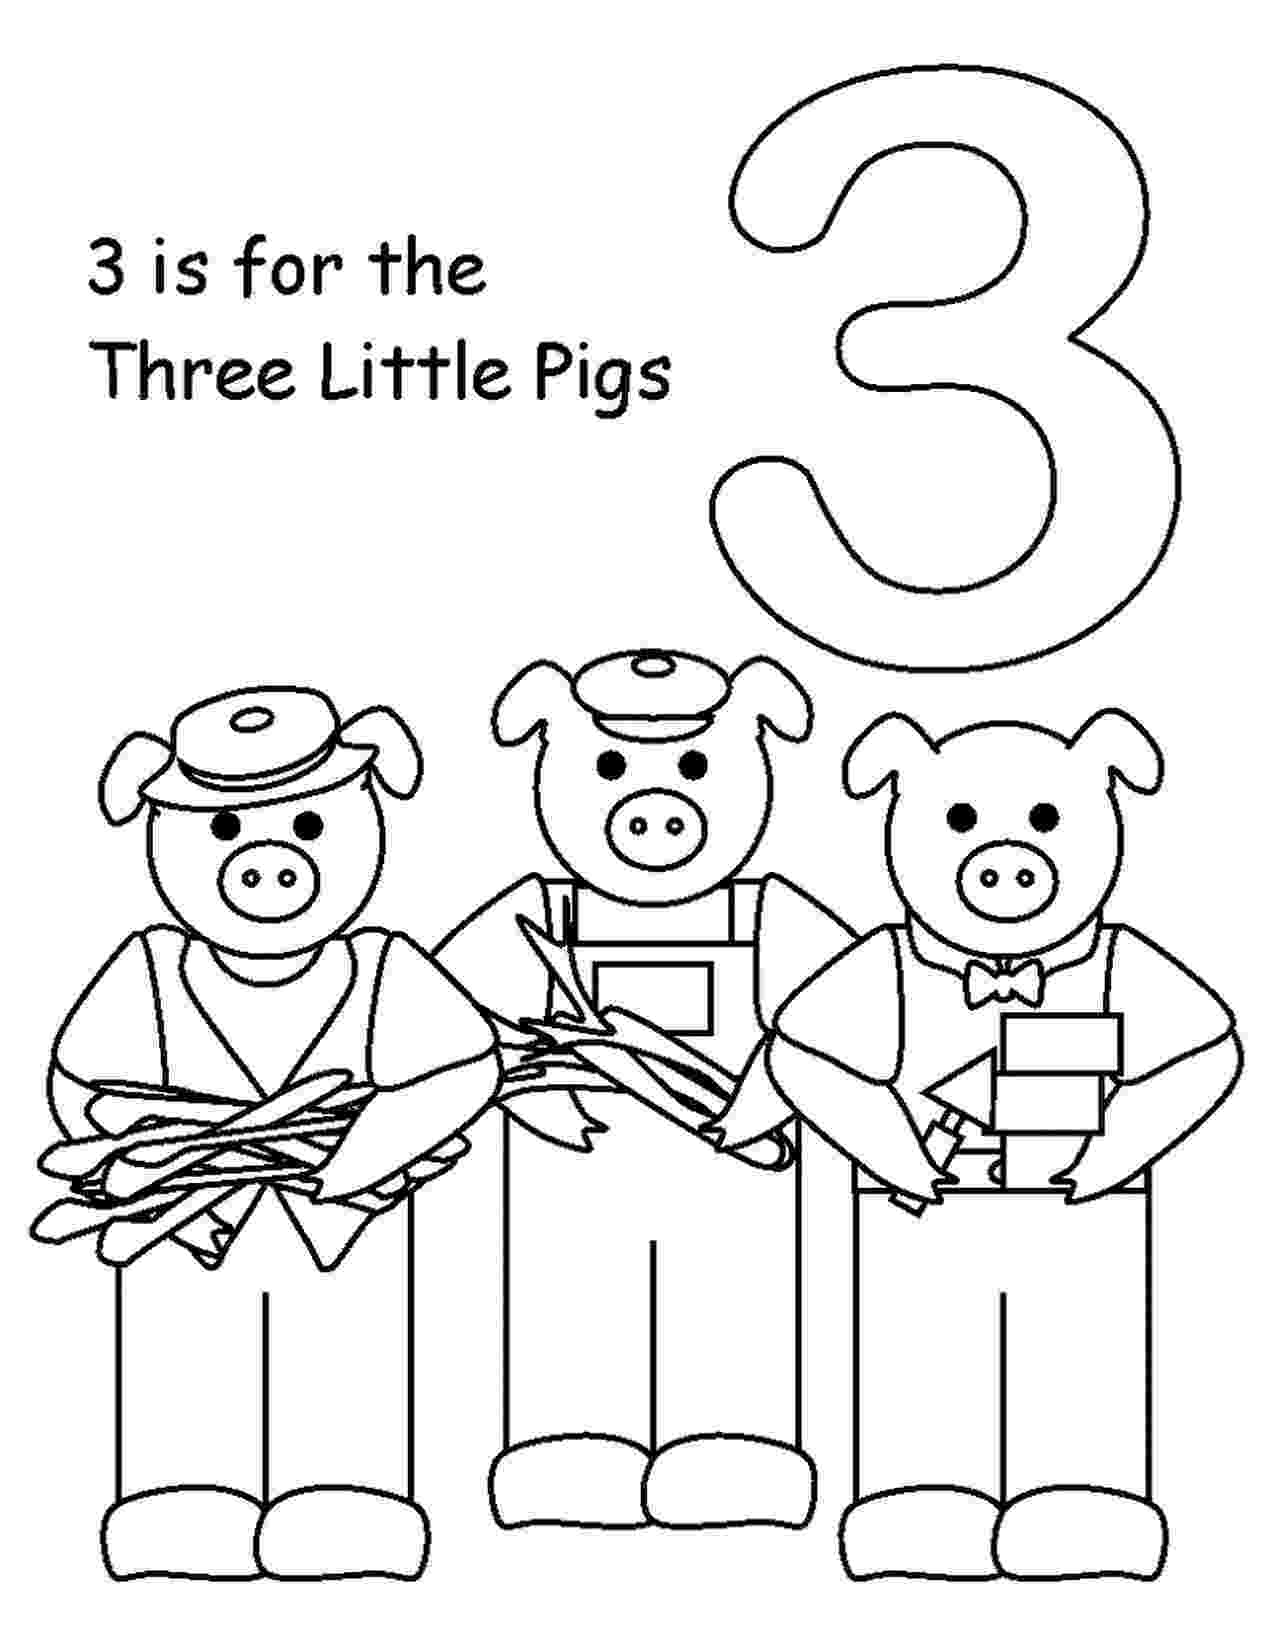 printable preschool coloring pages 13 best images of bible worksheets for preschoolers printable preschool coloring pages